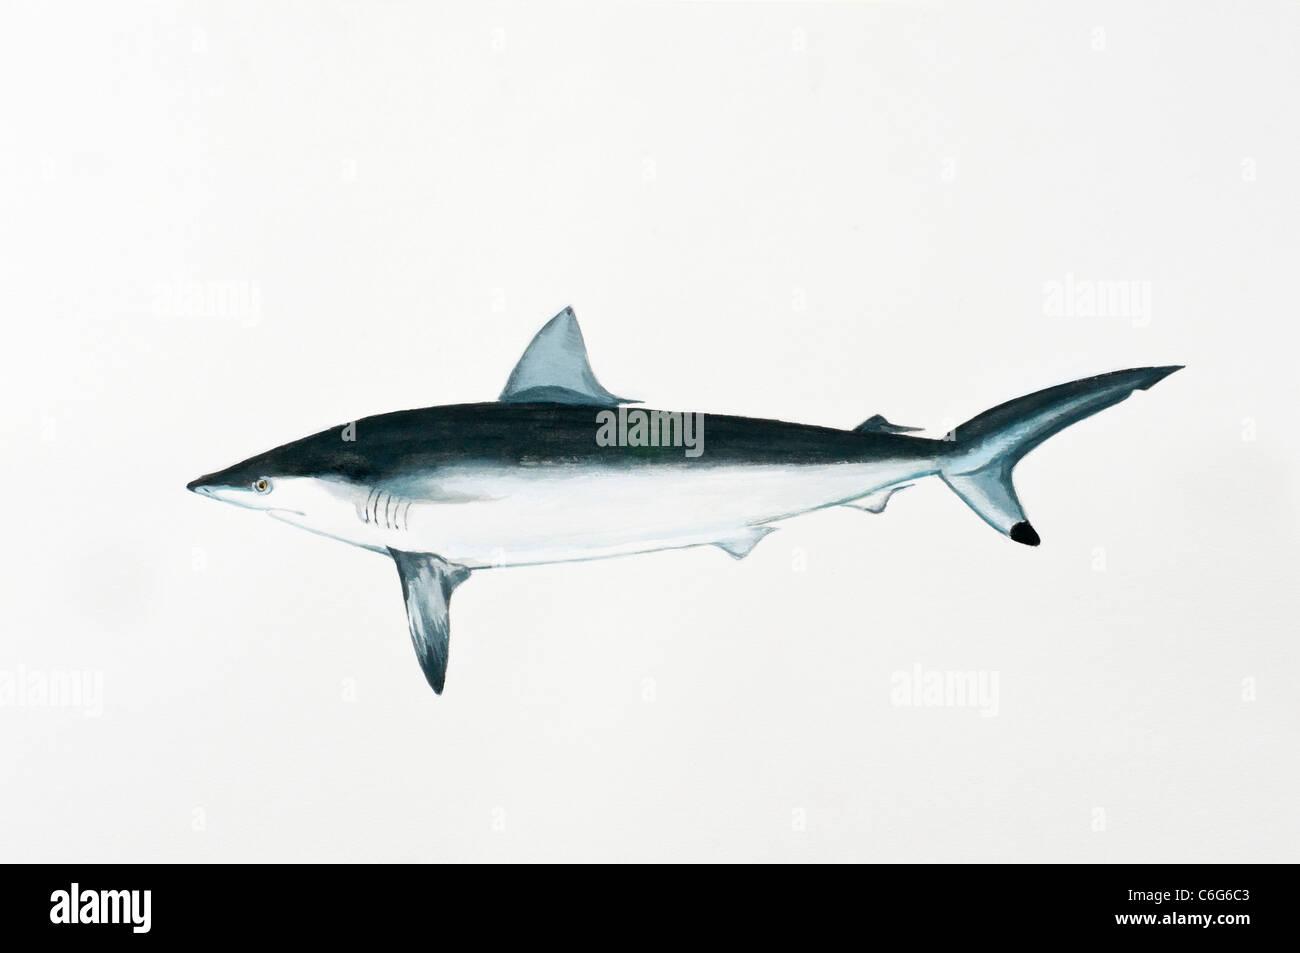 Spottail Shark, Carcharhinus sorrah, Carcharhinidae - Stock Image